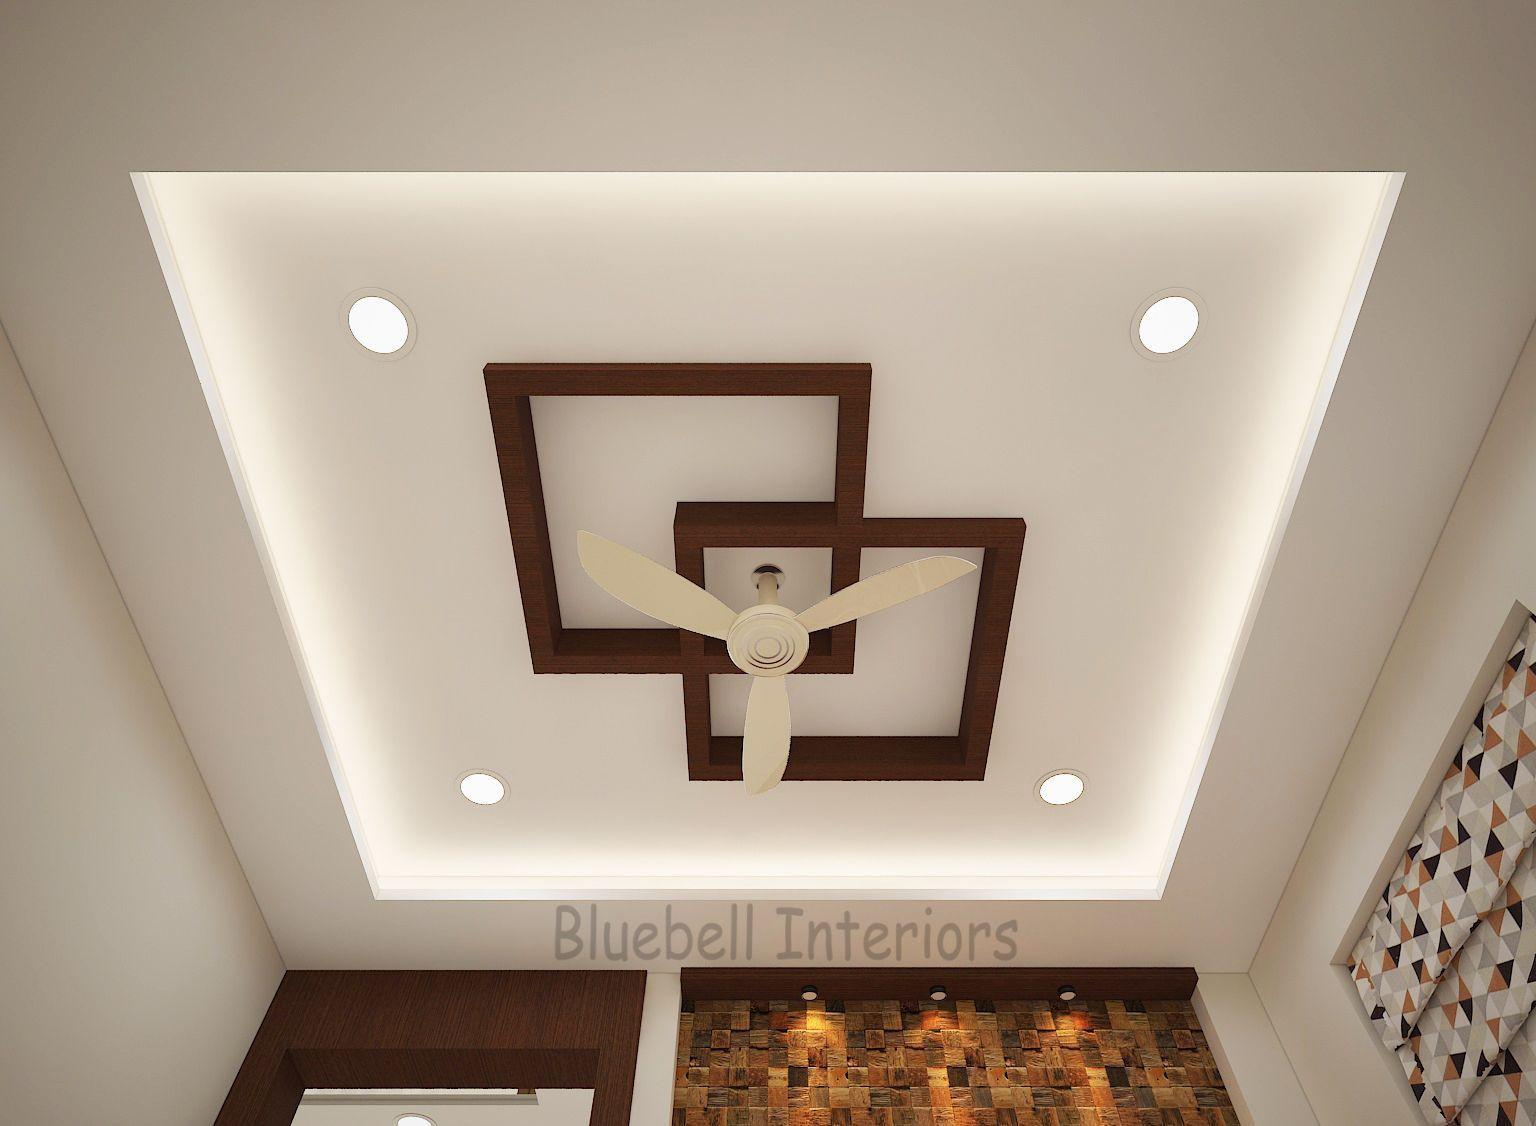 Simple Ceiling Design For Bedroom In 2020 Ceiling Design Living Room Drawing Room Ceiling Design Pvc Ceiling Design